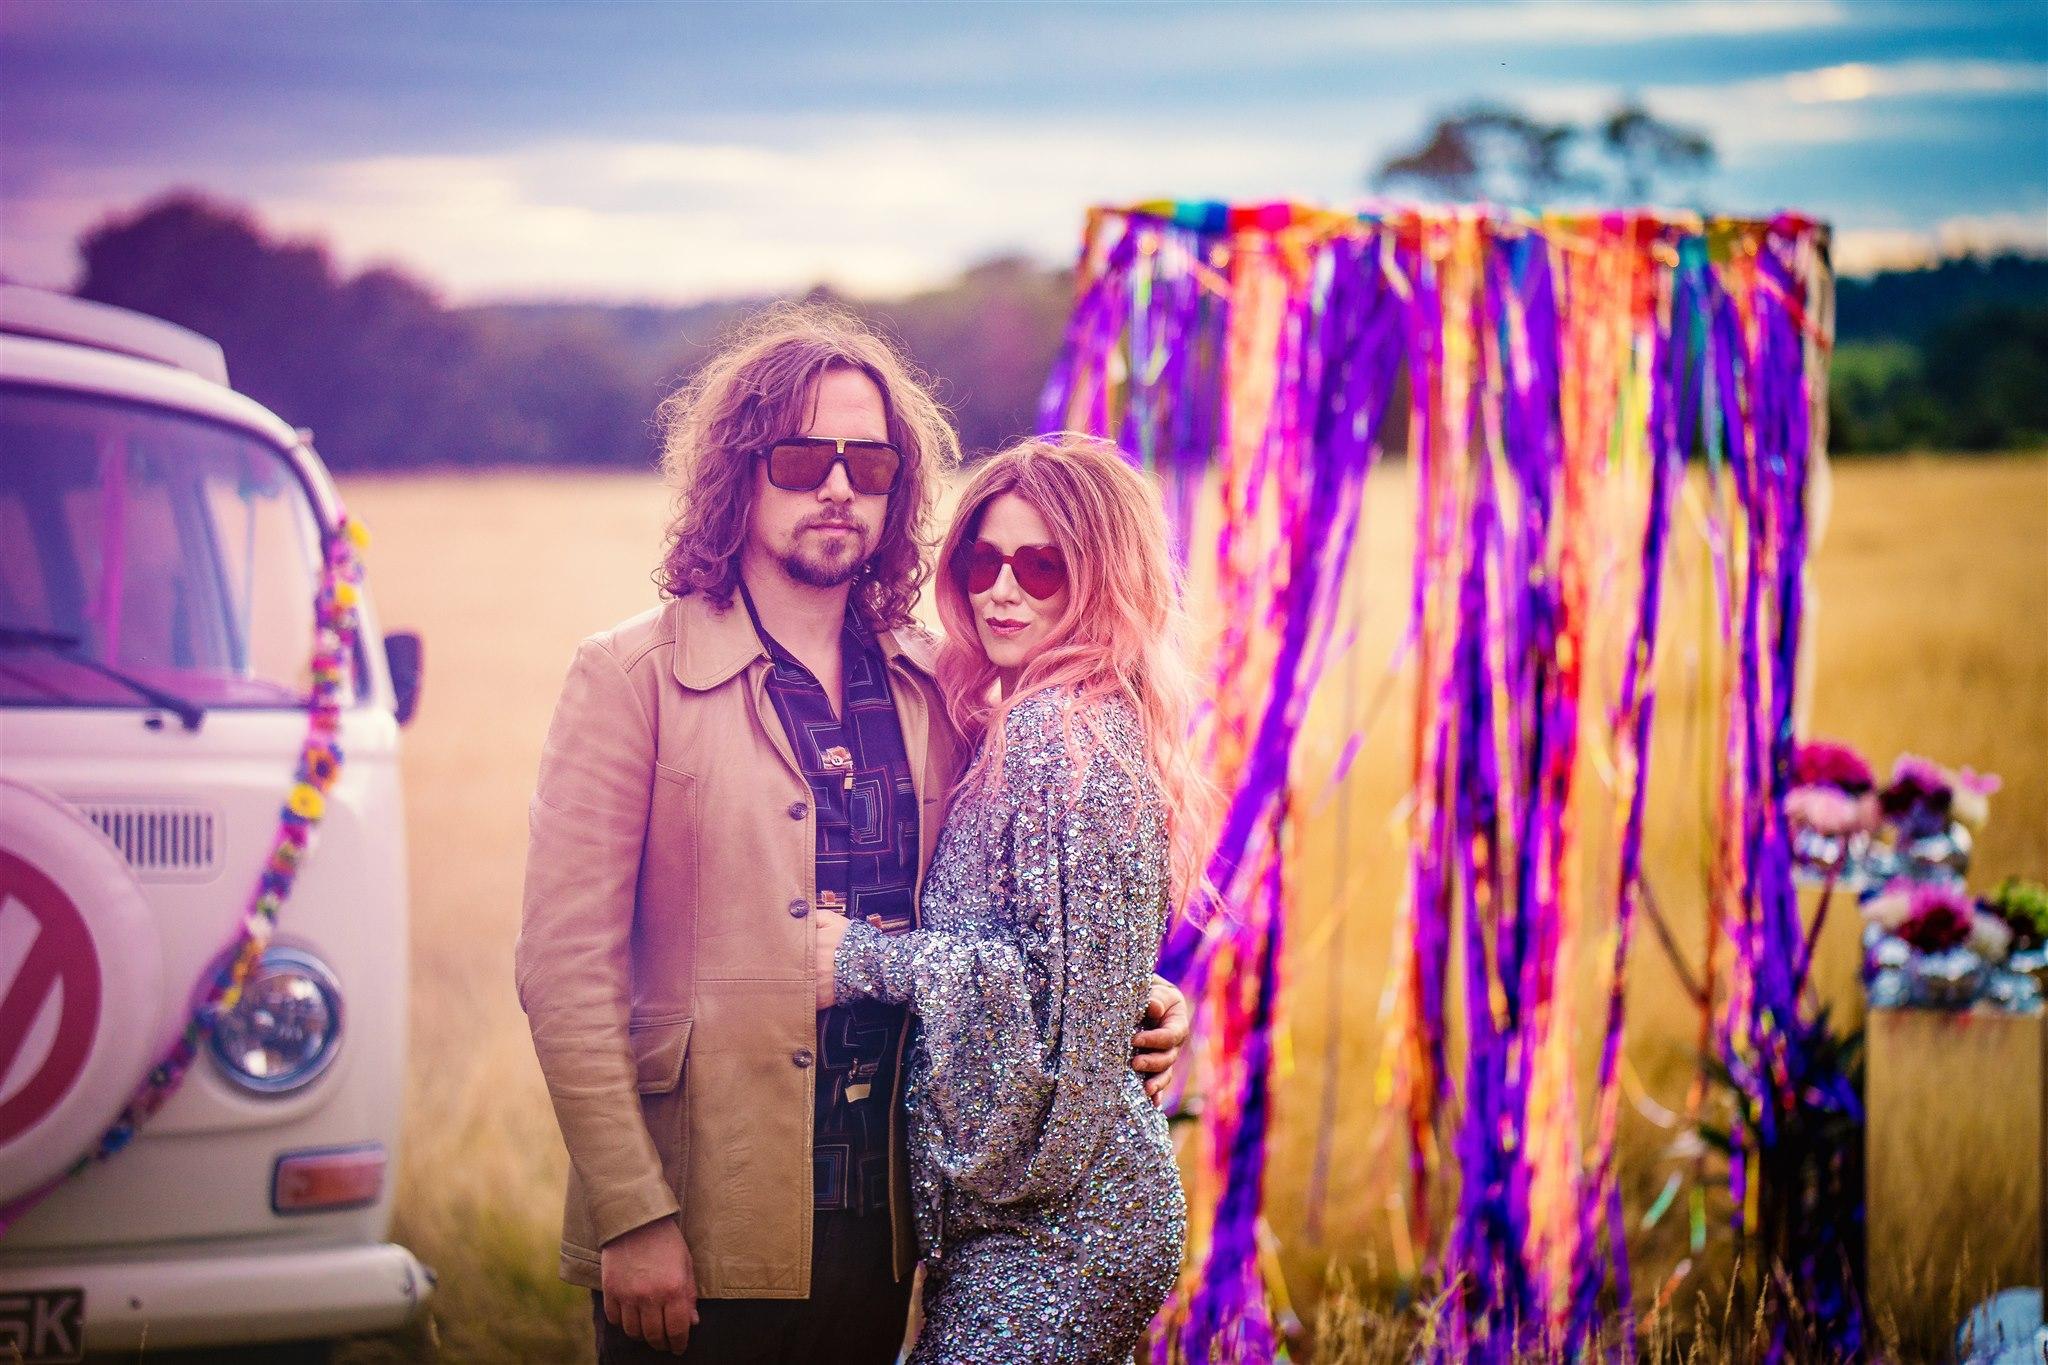 retro wedding - colourful bohemian wedding - 70s wedding - campervan wedding - hippie wedding